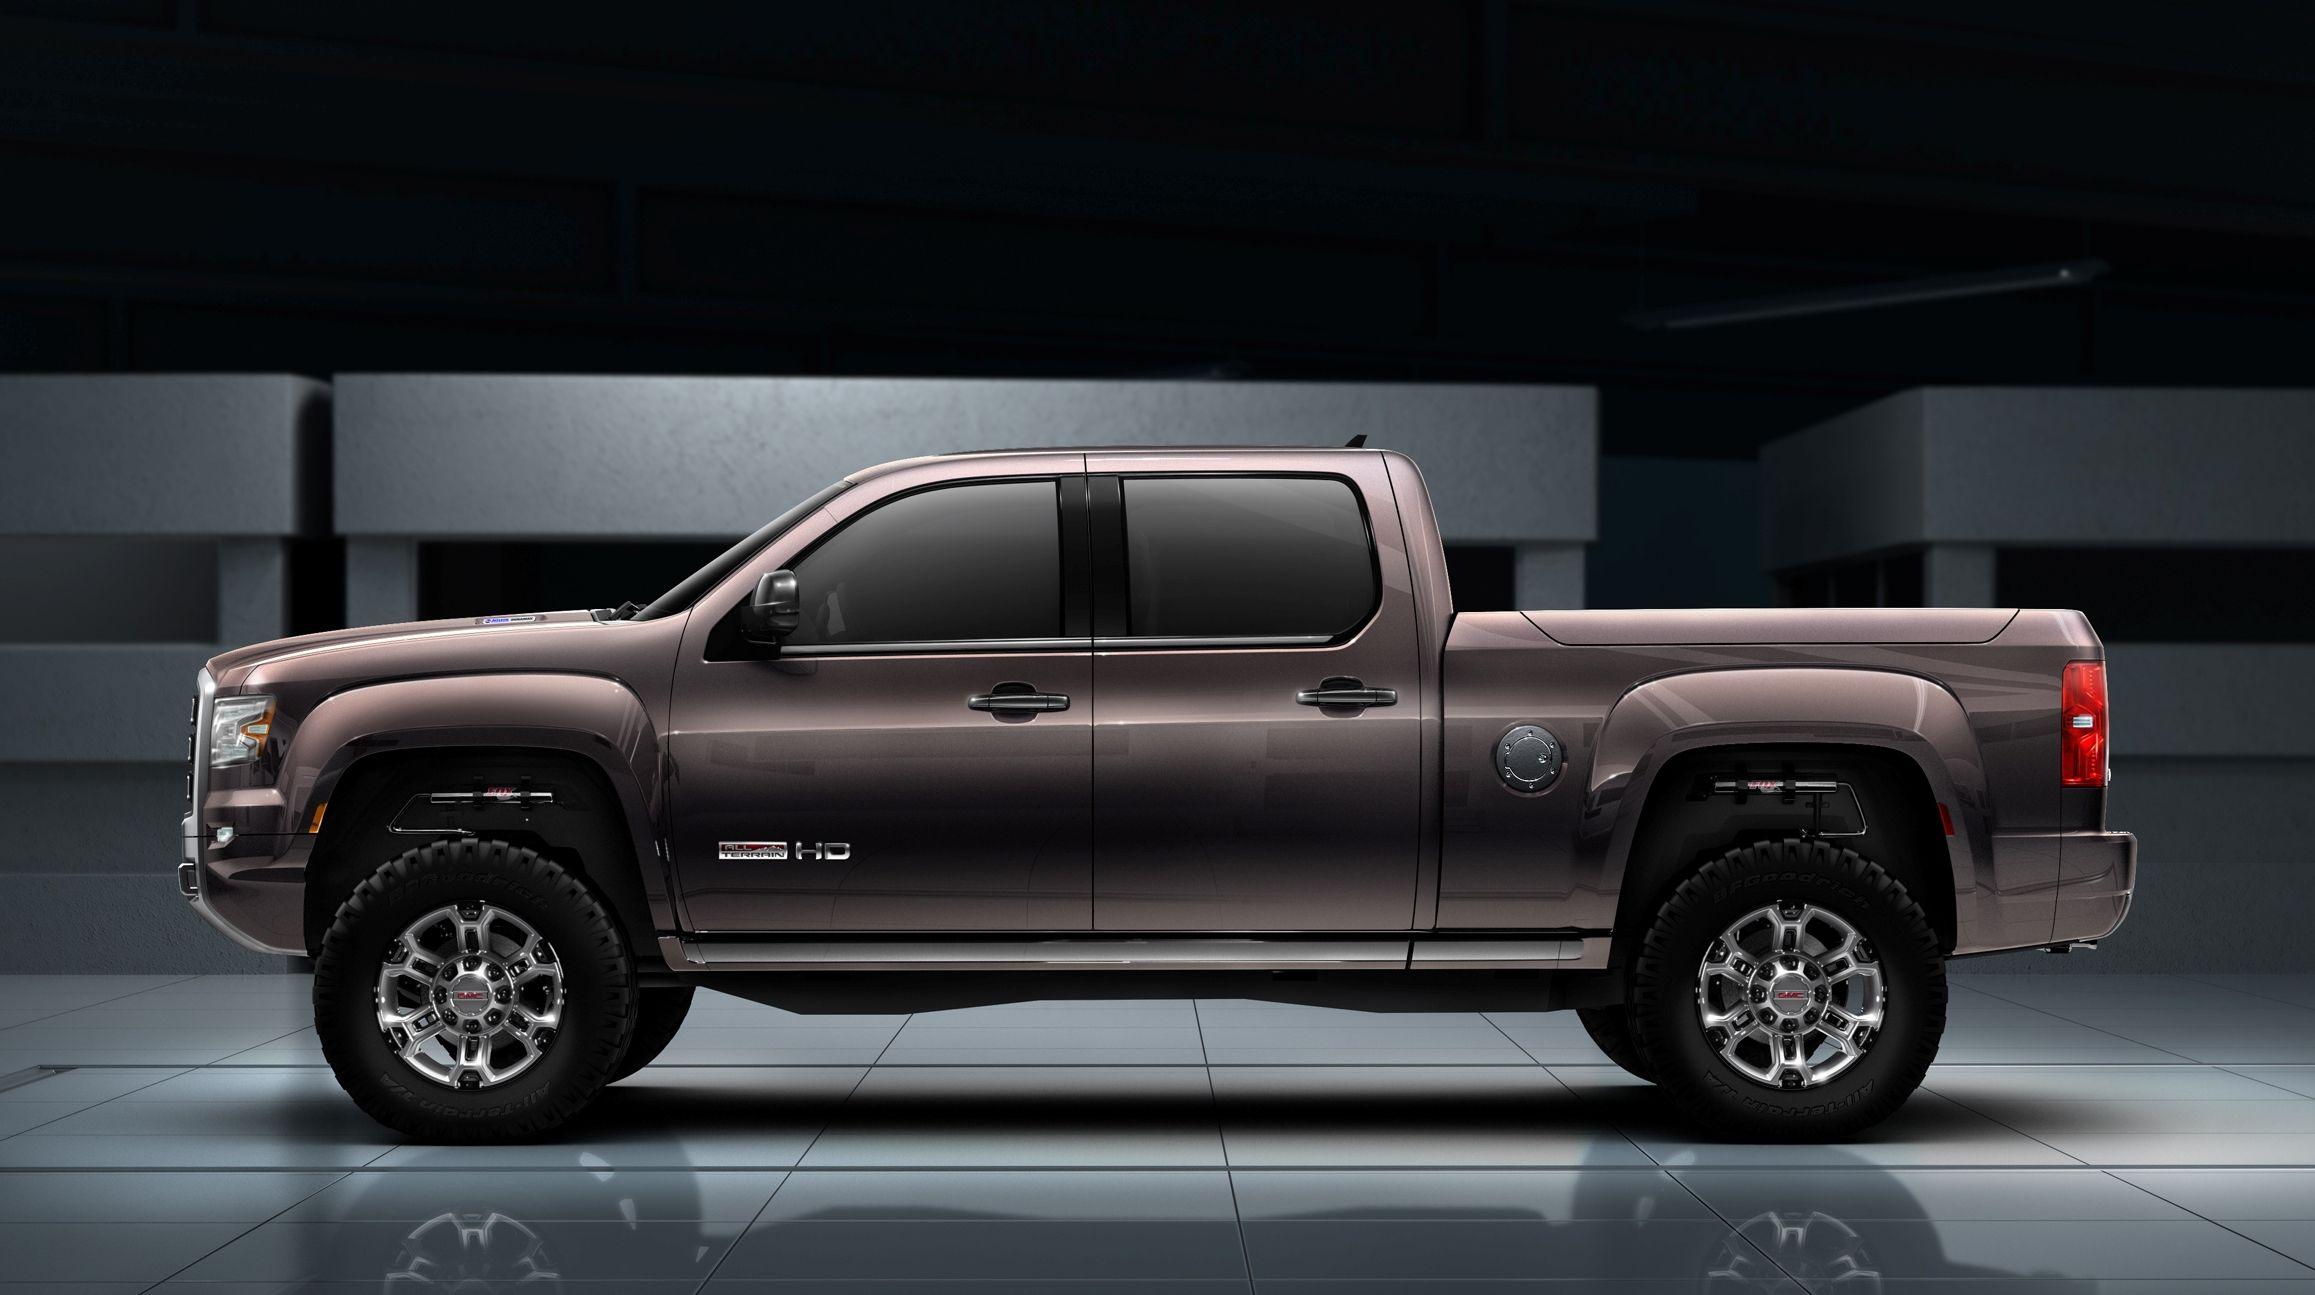 Dodge Ram Trucks Gmc trucks, Concept cars, Ford trucks